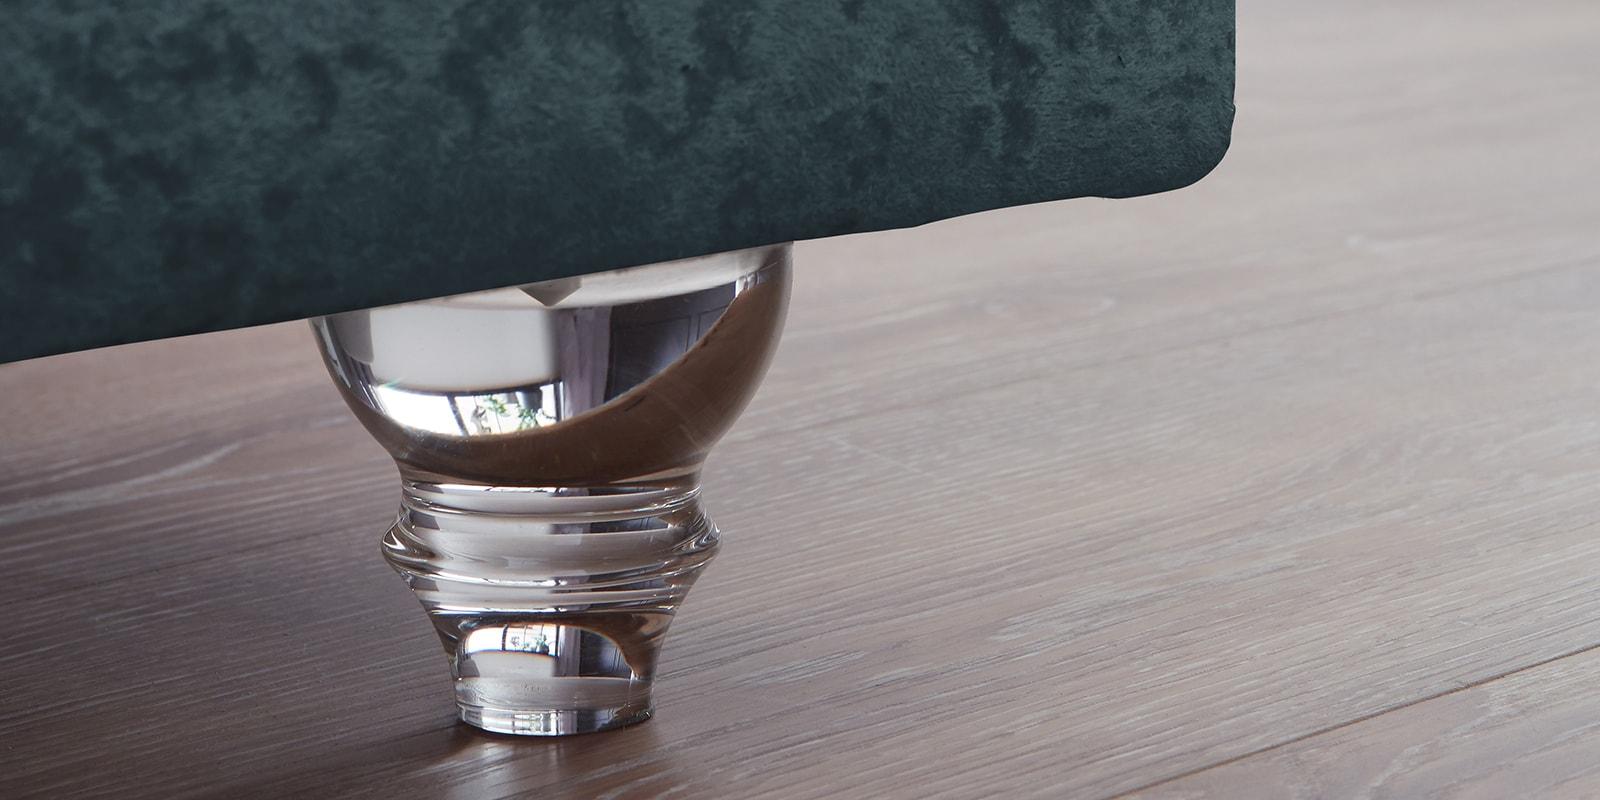 Moebella24 - Boxspringbett Roma - Chesterfield Stil mit Knopfheftung - samt petrol - Acryl Füße in Glasoptik